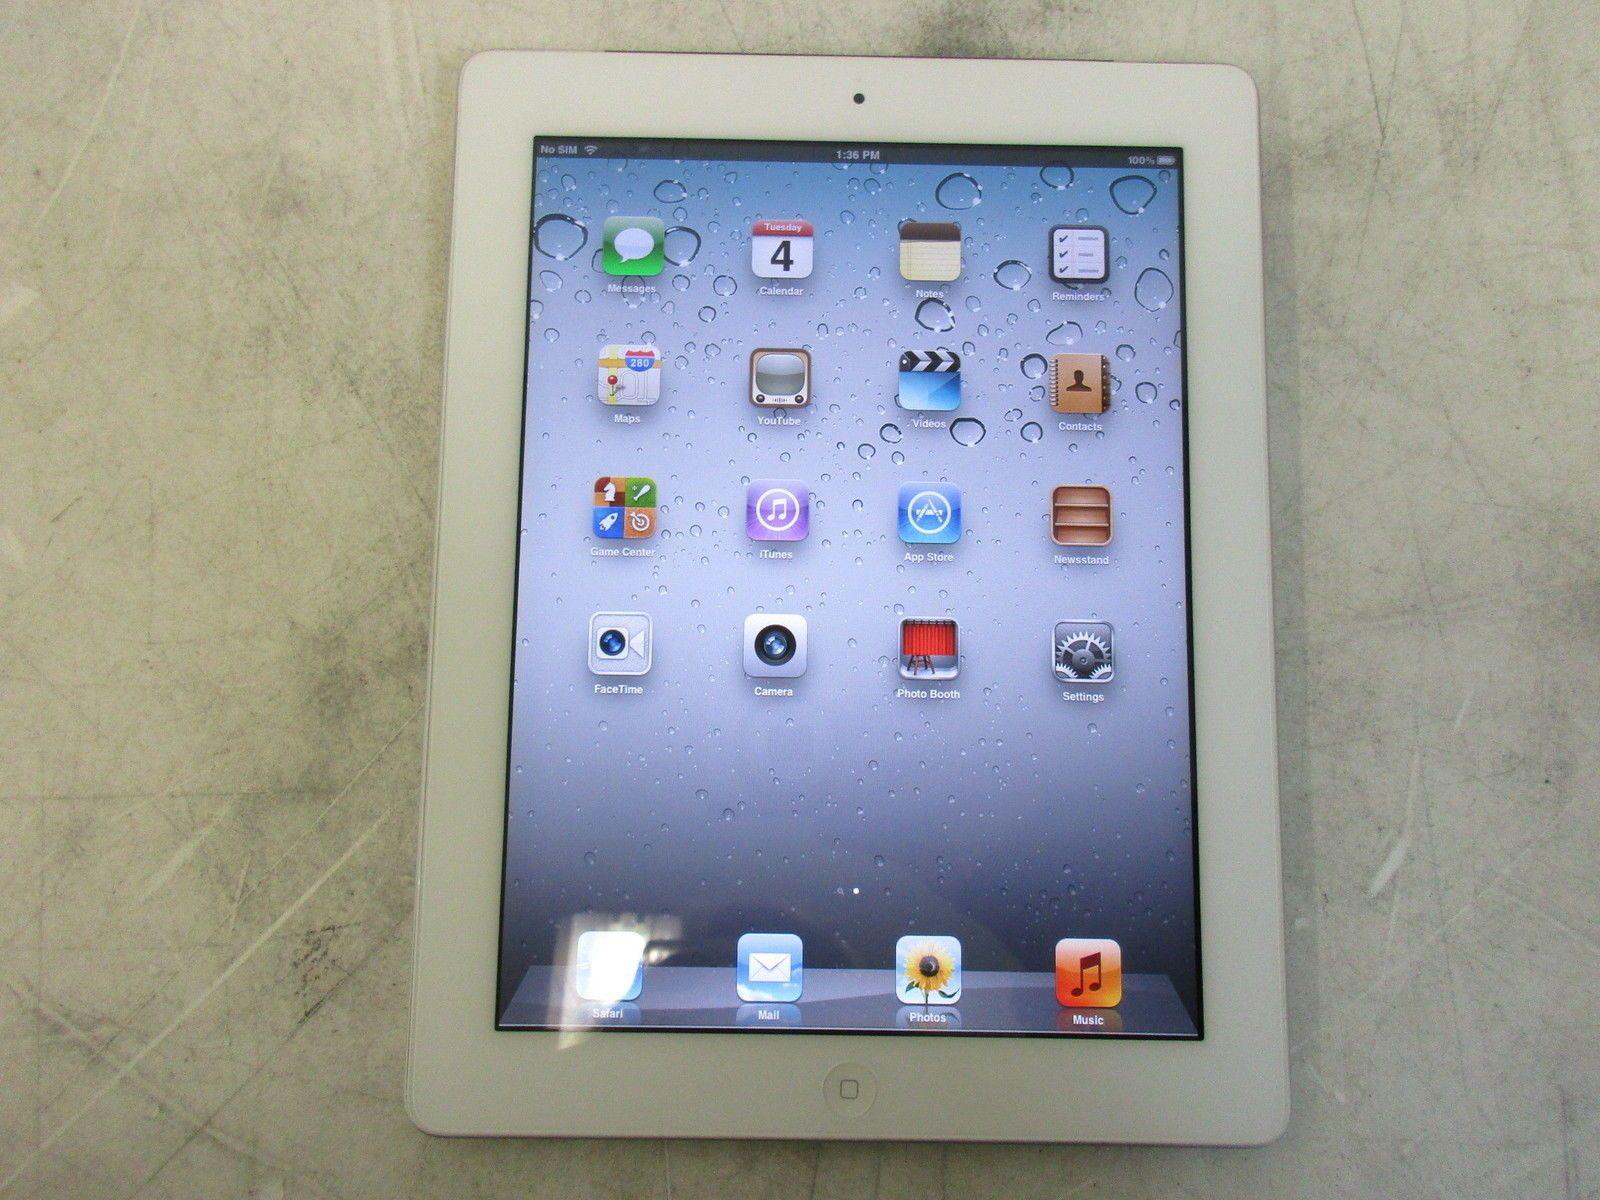 Apple iPad 2nd Gen WiFi  Unknown Carrier 64GB MC984FD White https://t.co/b6CtSWIcrm https://t.co/akPSSiWL5I